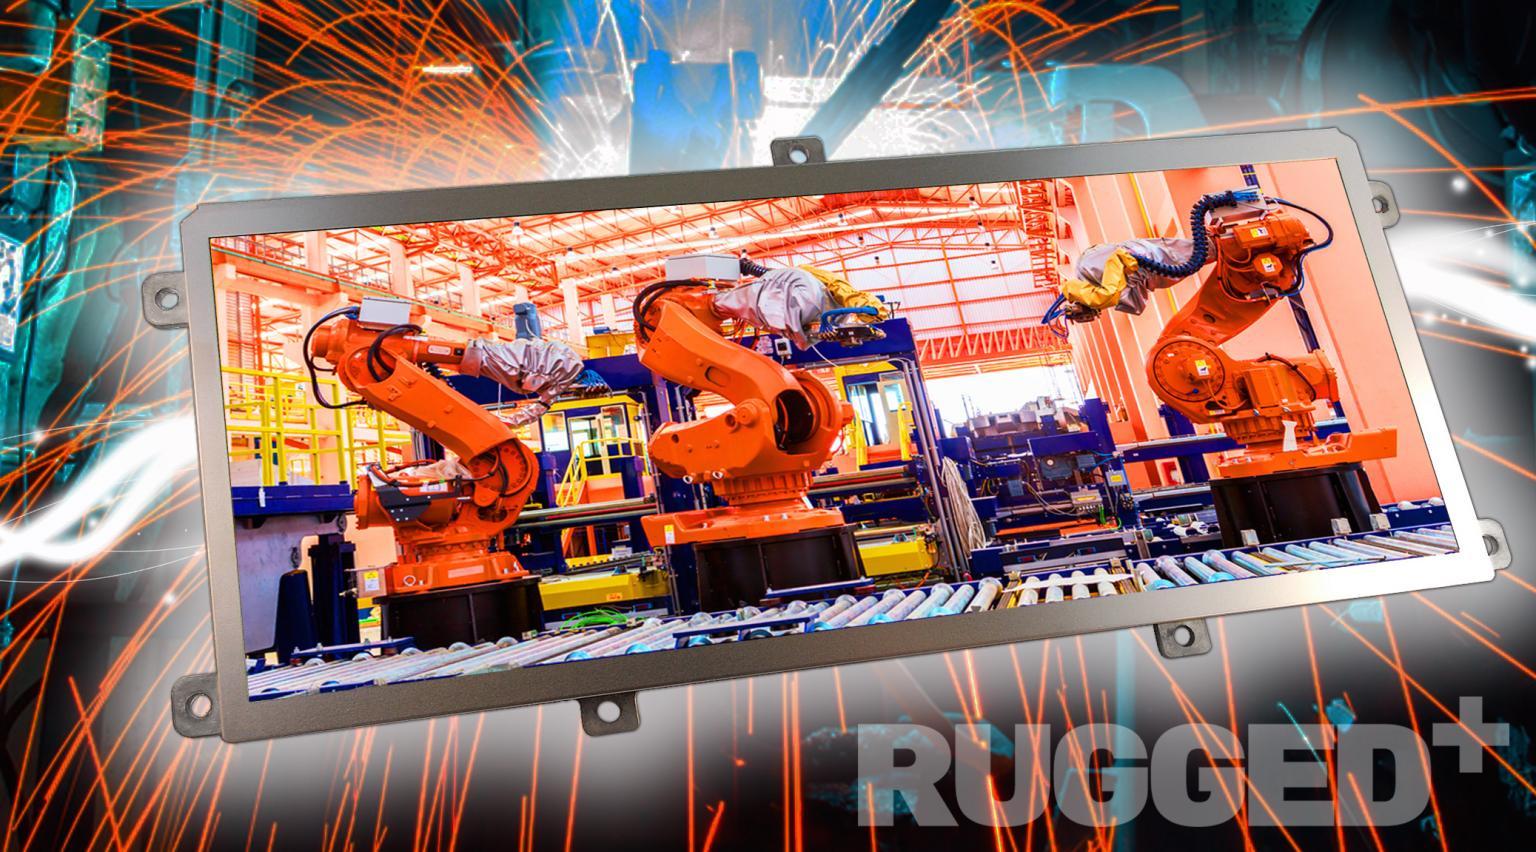 KOE 12.3-inch Rugged+ TFT TX31D203VM0EAB